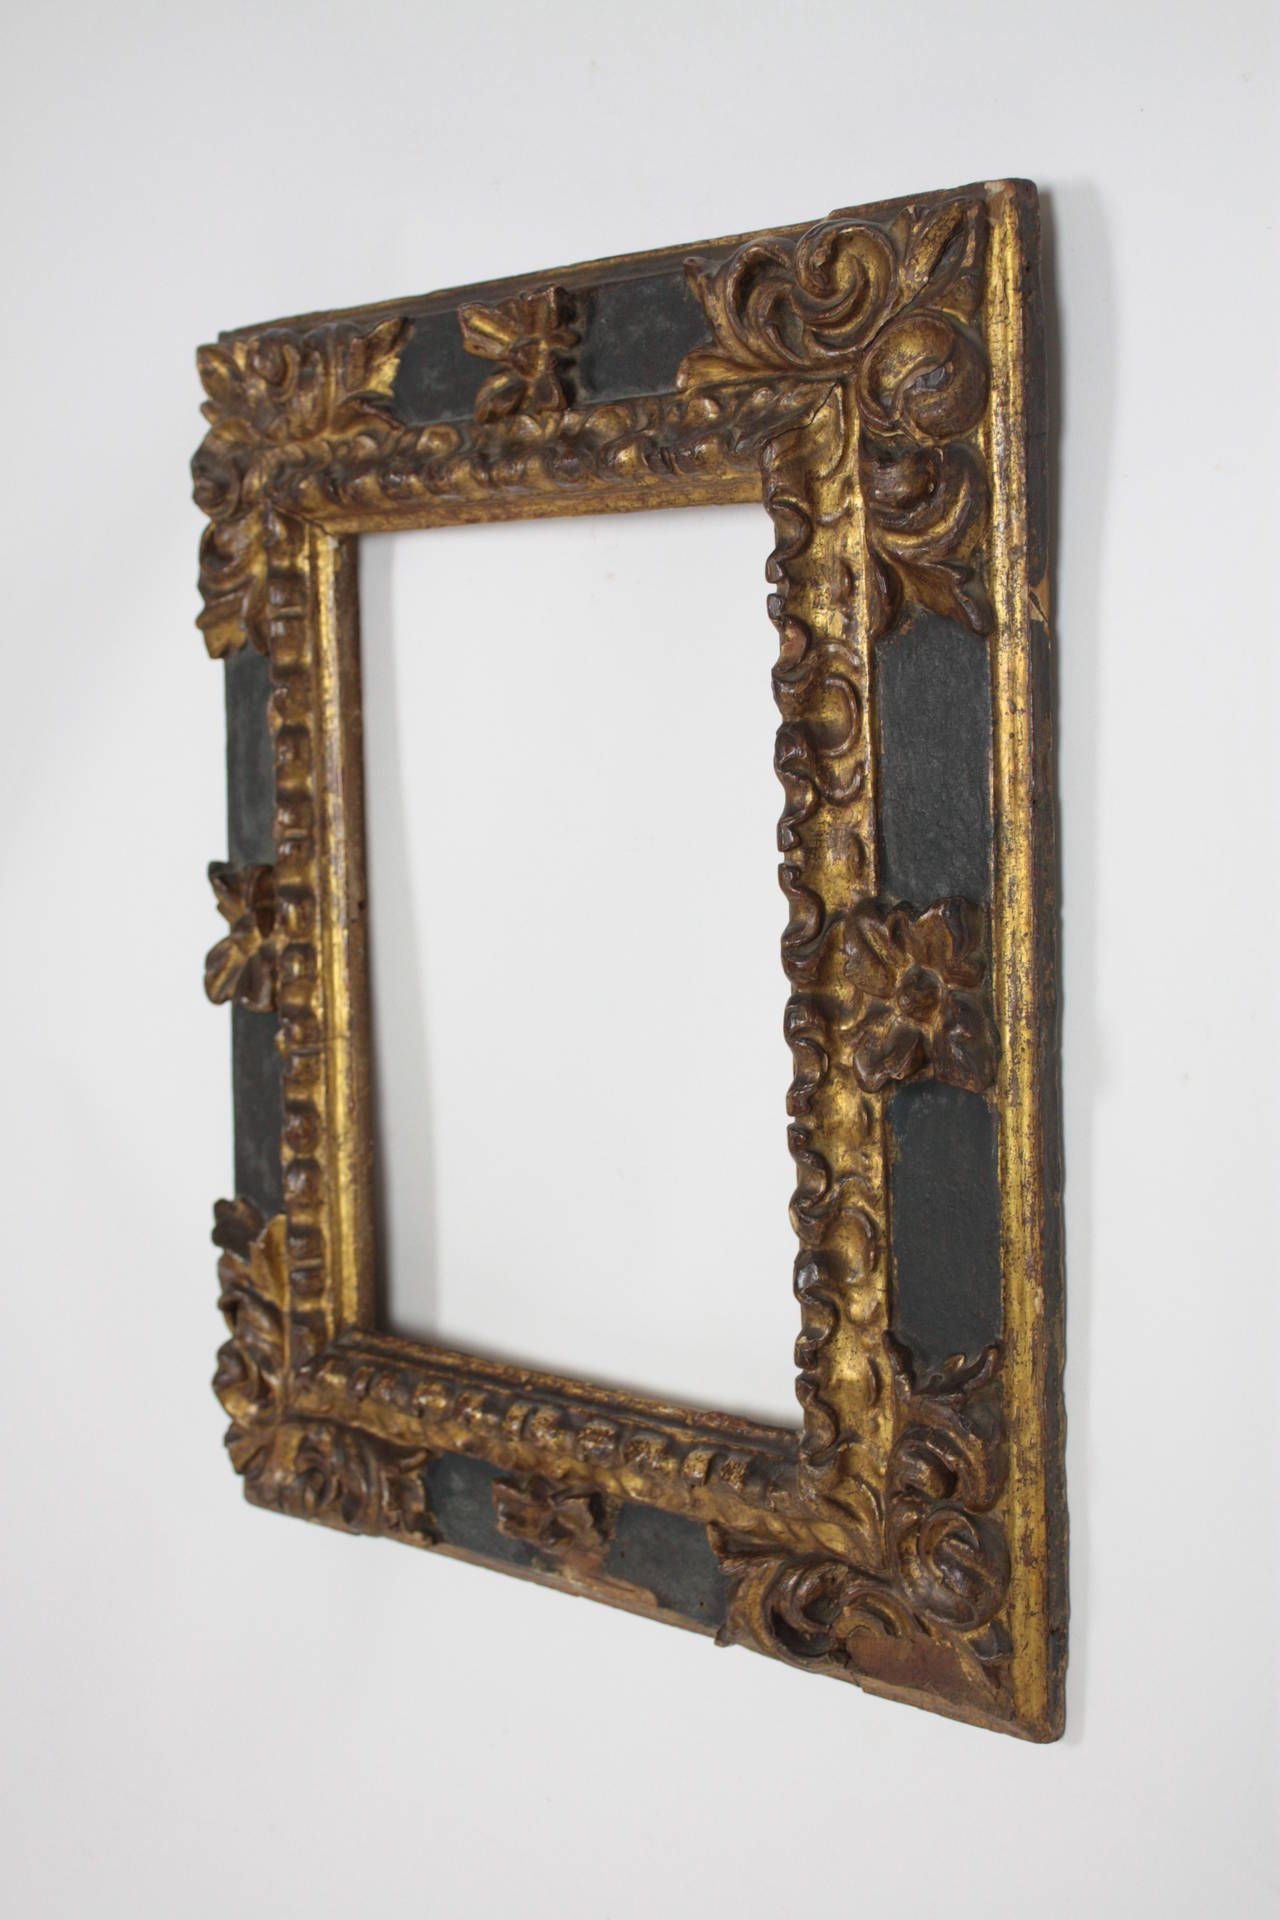 17th Century Spanish Baroque Carved Wood Gold Leaf Frame